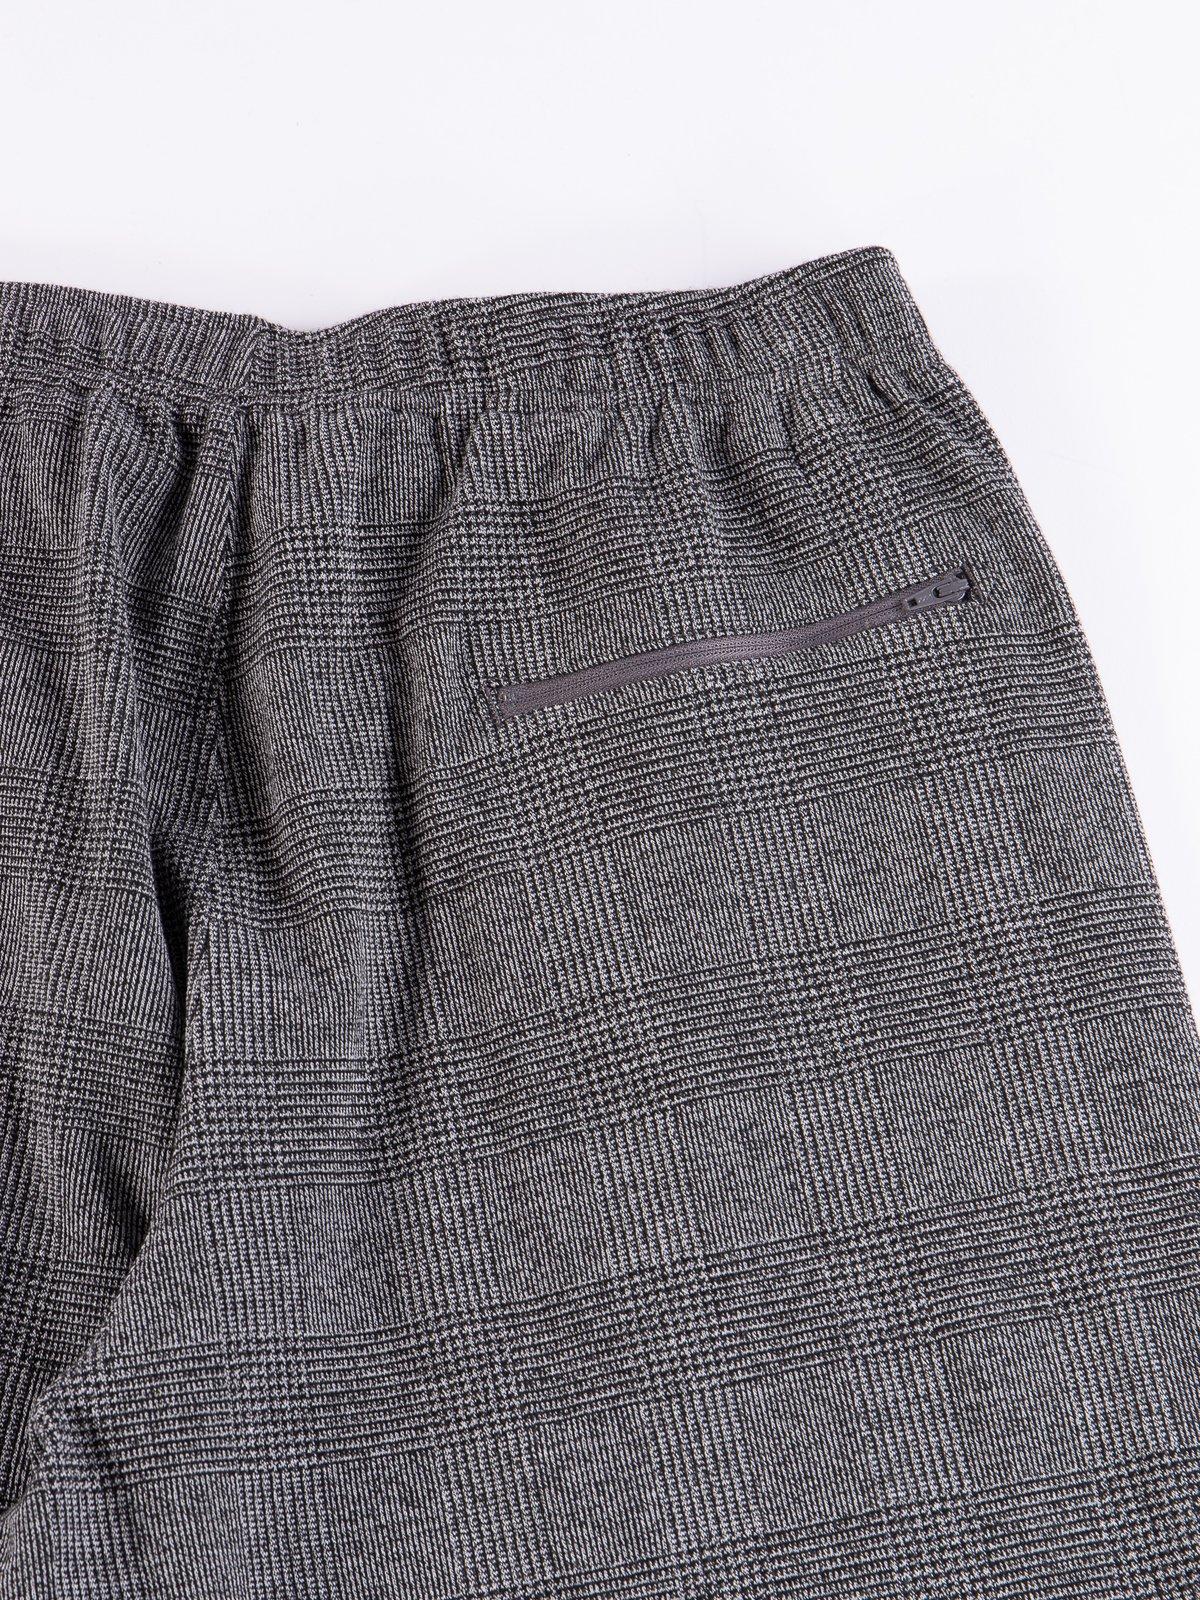 Grey PC Knit Glen Plaid Jog Pant - Image 7